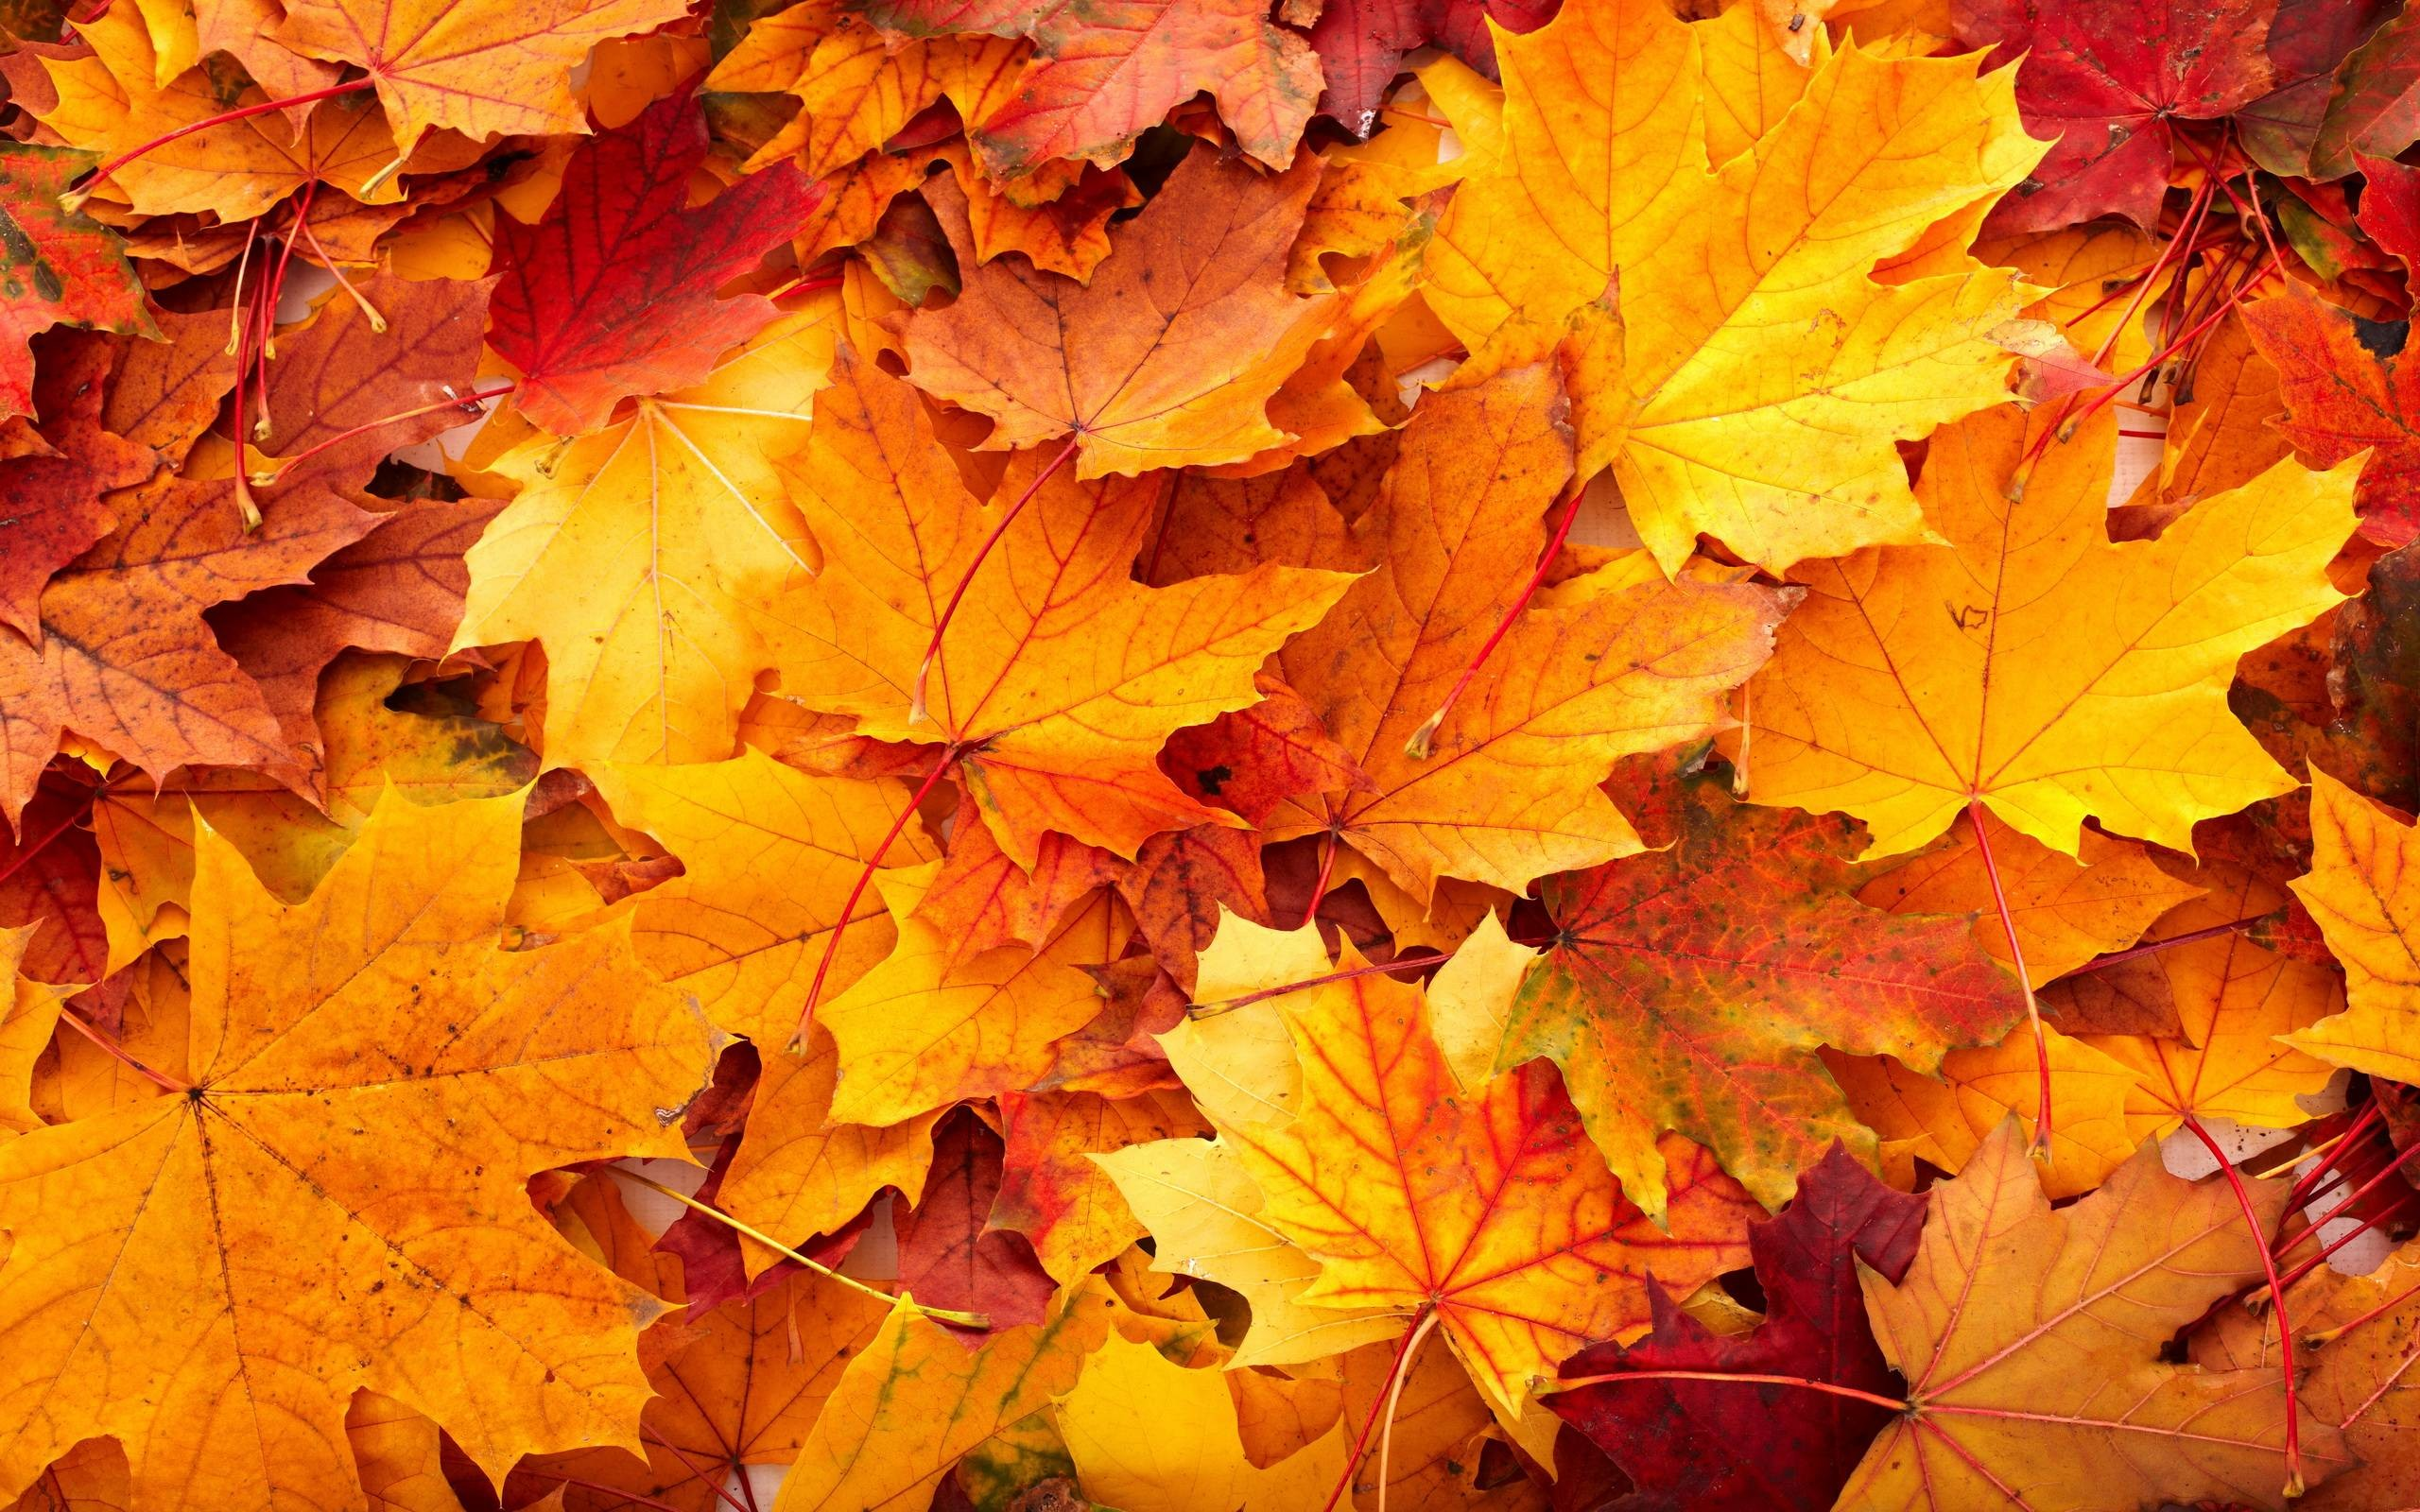 Fall Leaves Nature High Resolution Wallpaper Desktop Backgrounds Free